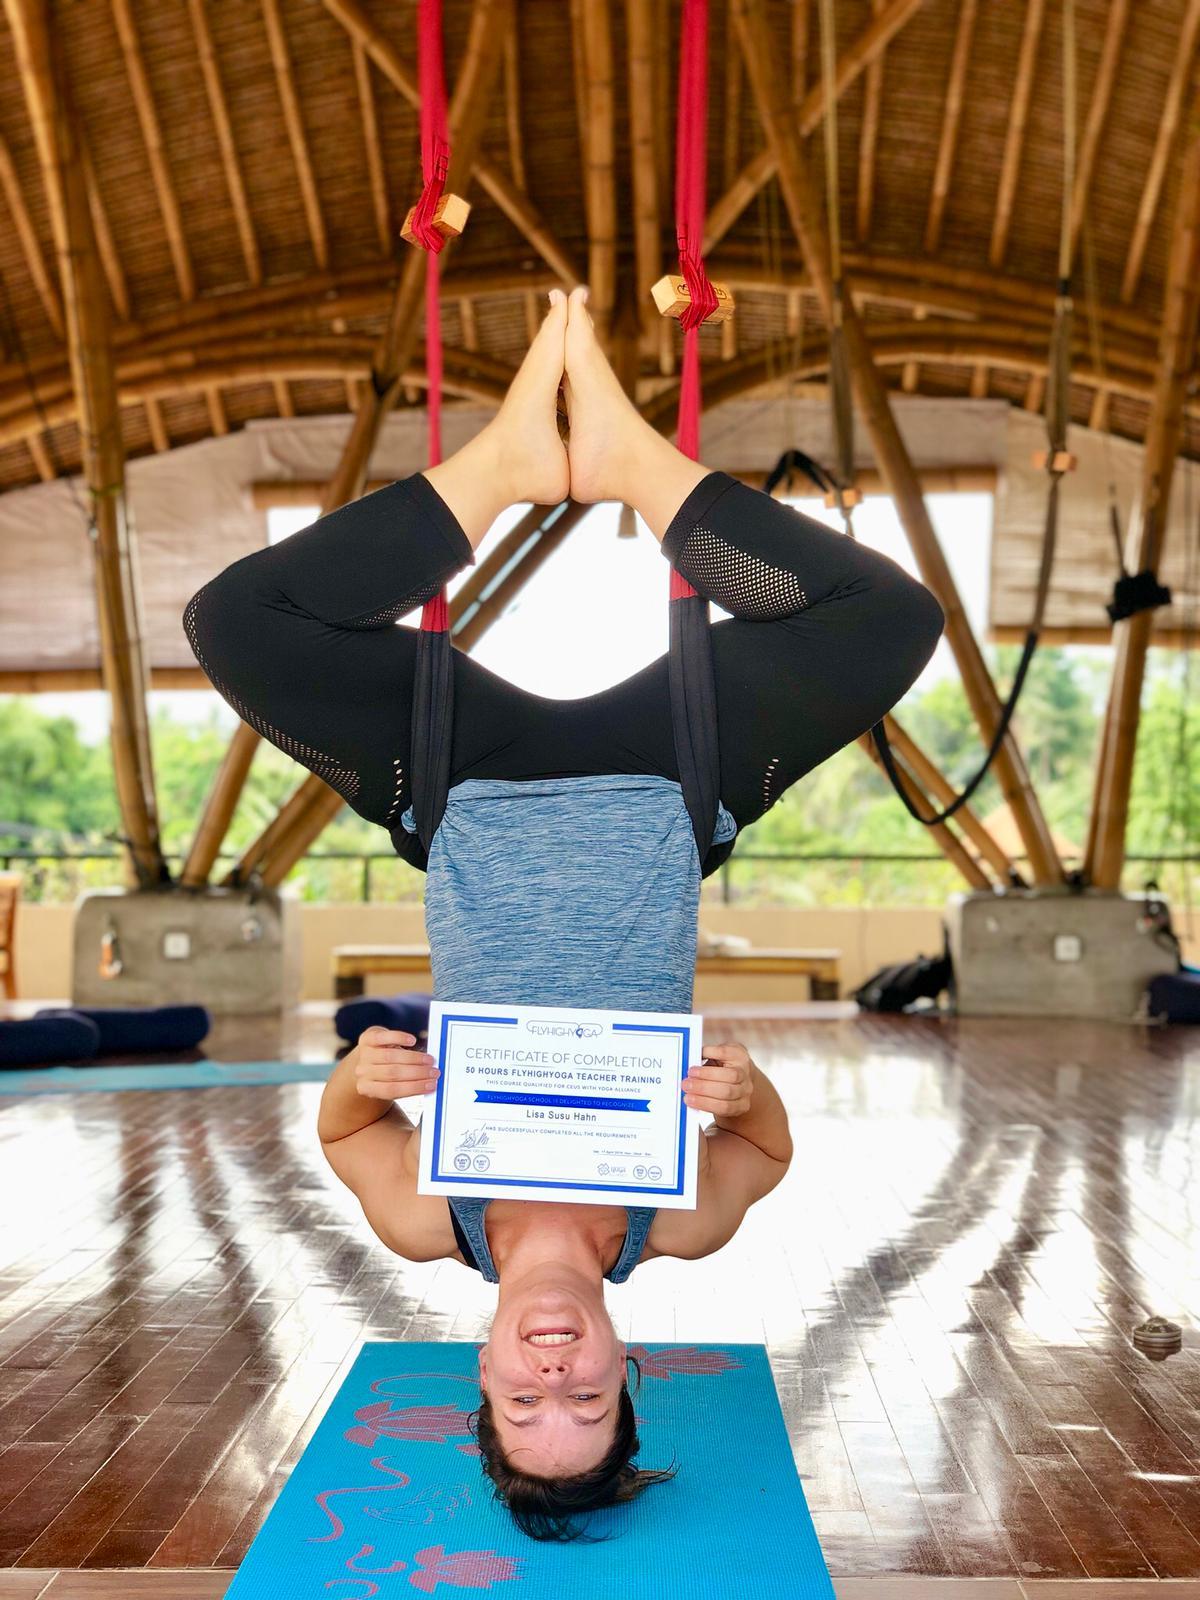 Lisa darf jetzt Fly-High-Yoga lehren